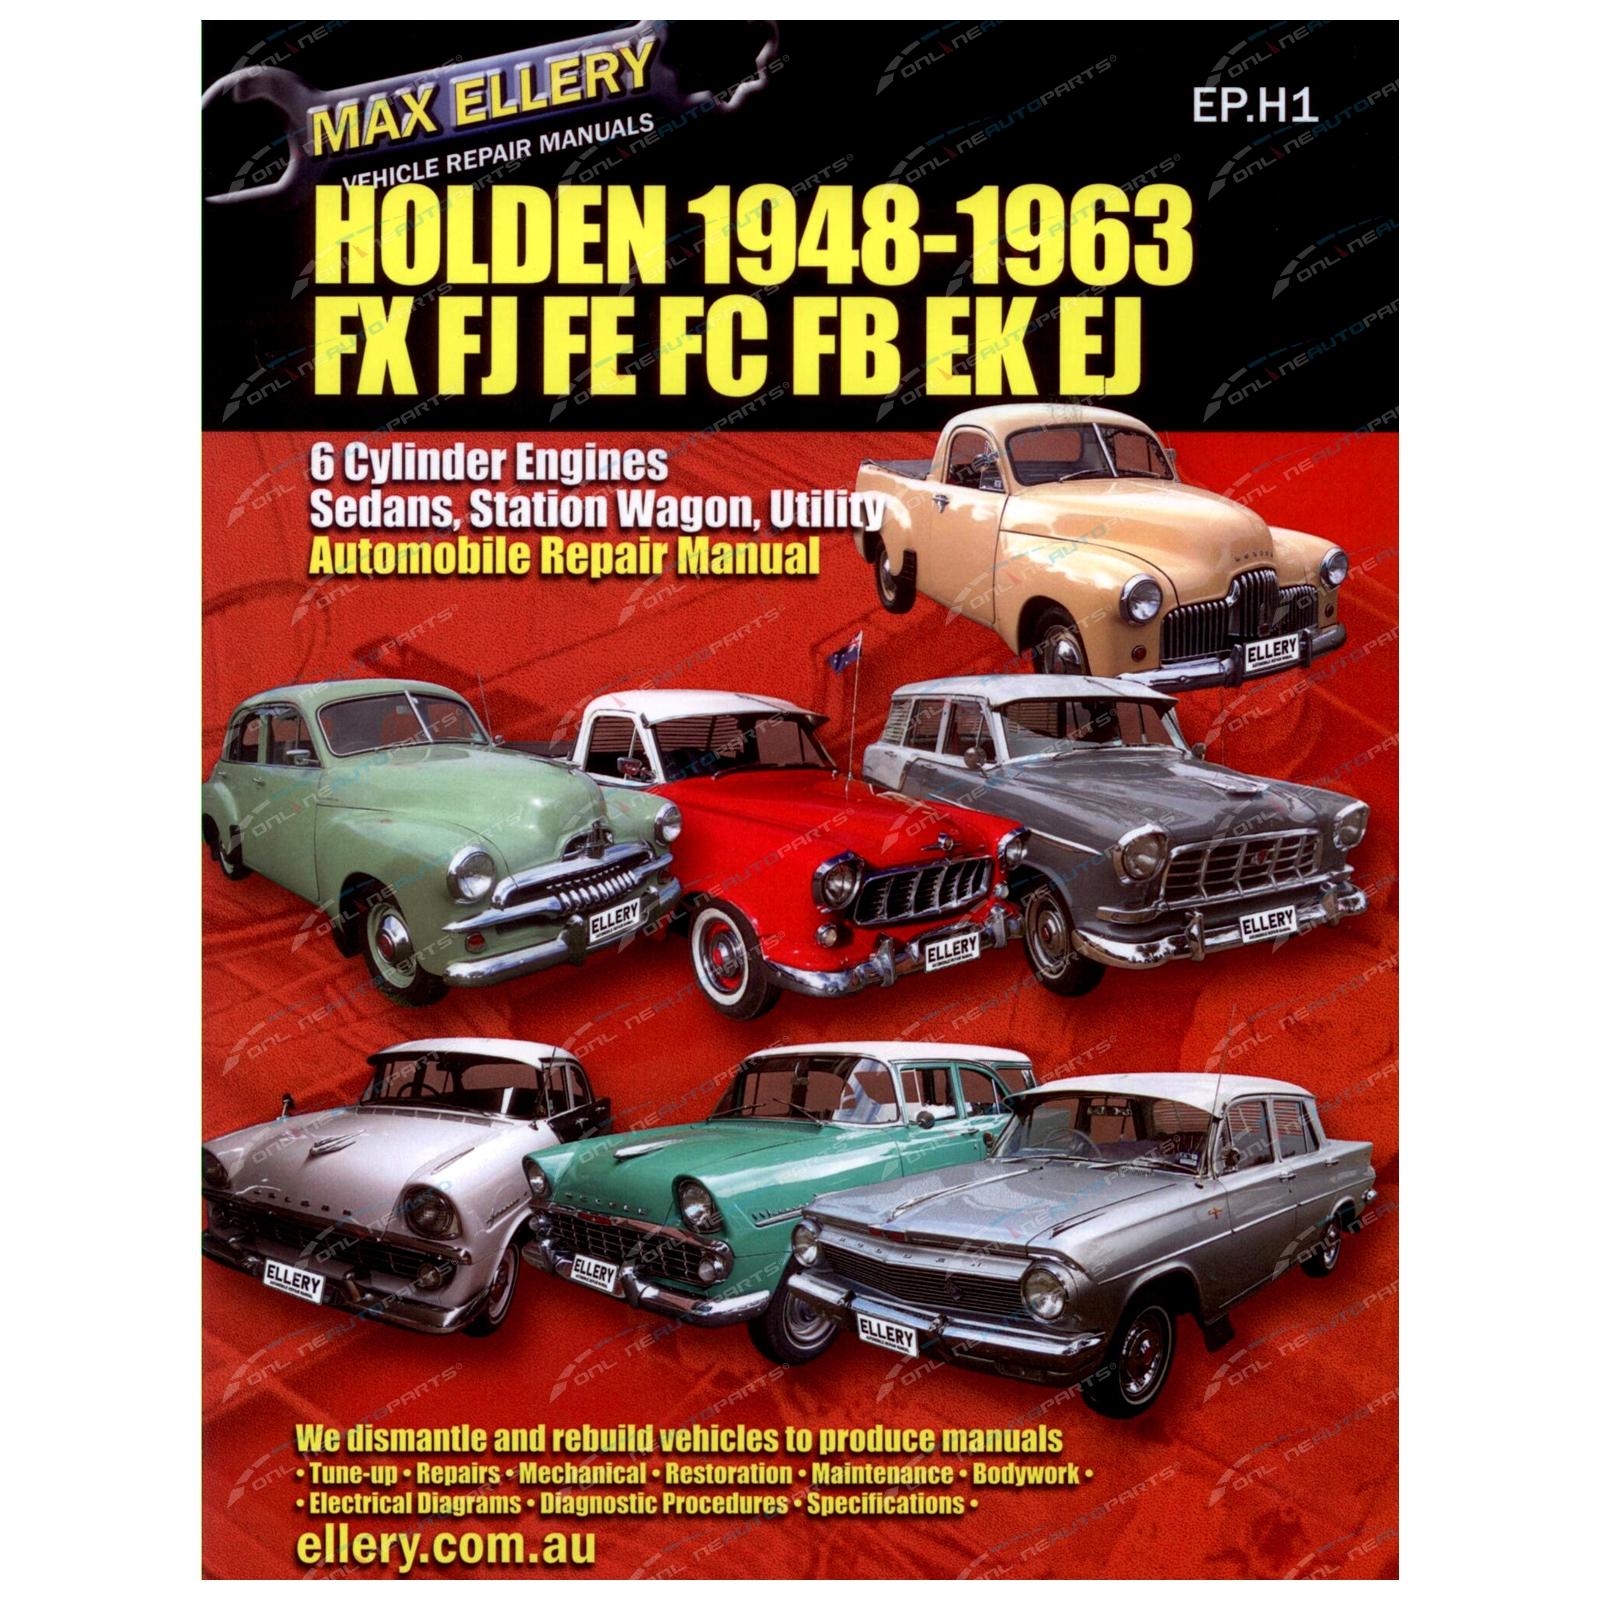 Workshop Manual Holden FX FJ FE FC FB EK EJ 1948-1963 Factory Repair Book Ellery